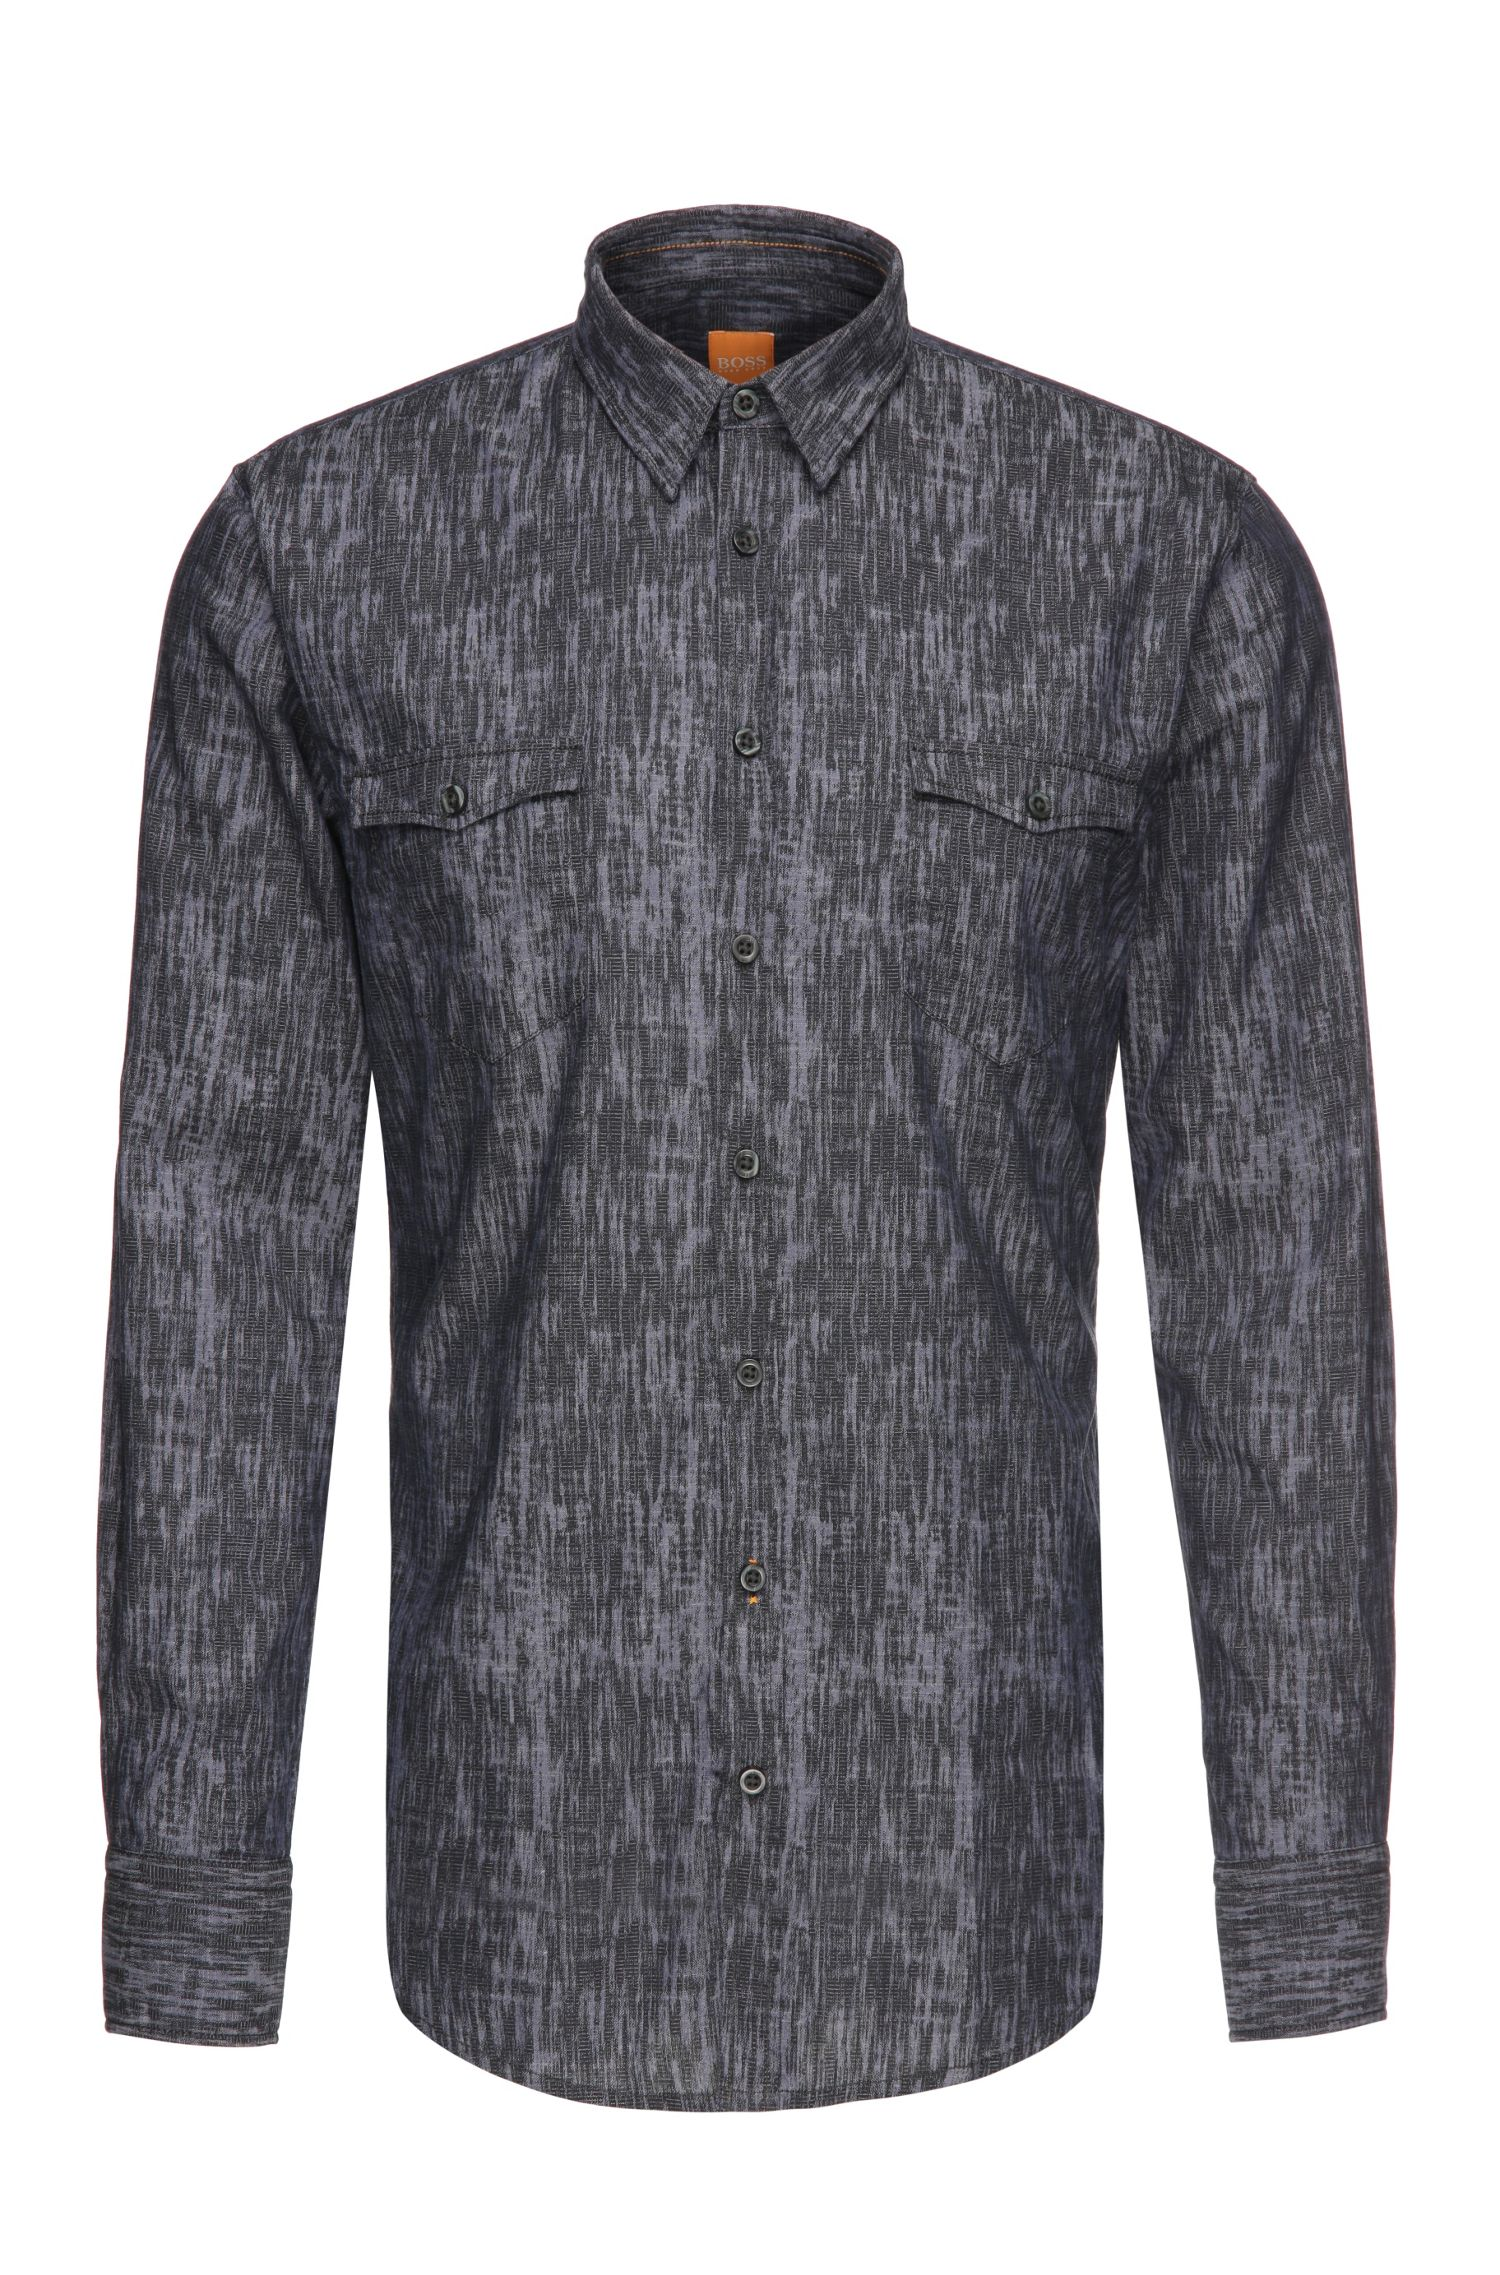 'EdoslimE'   Slim Fit, Cotton Printed Chambray Button Down Shirt